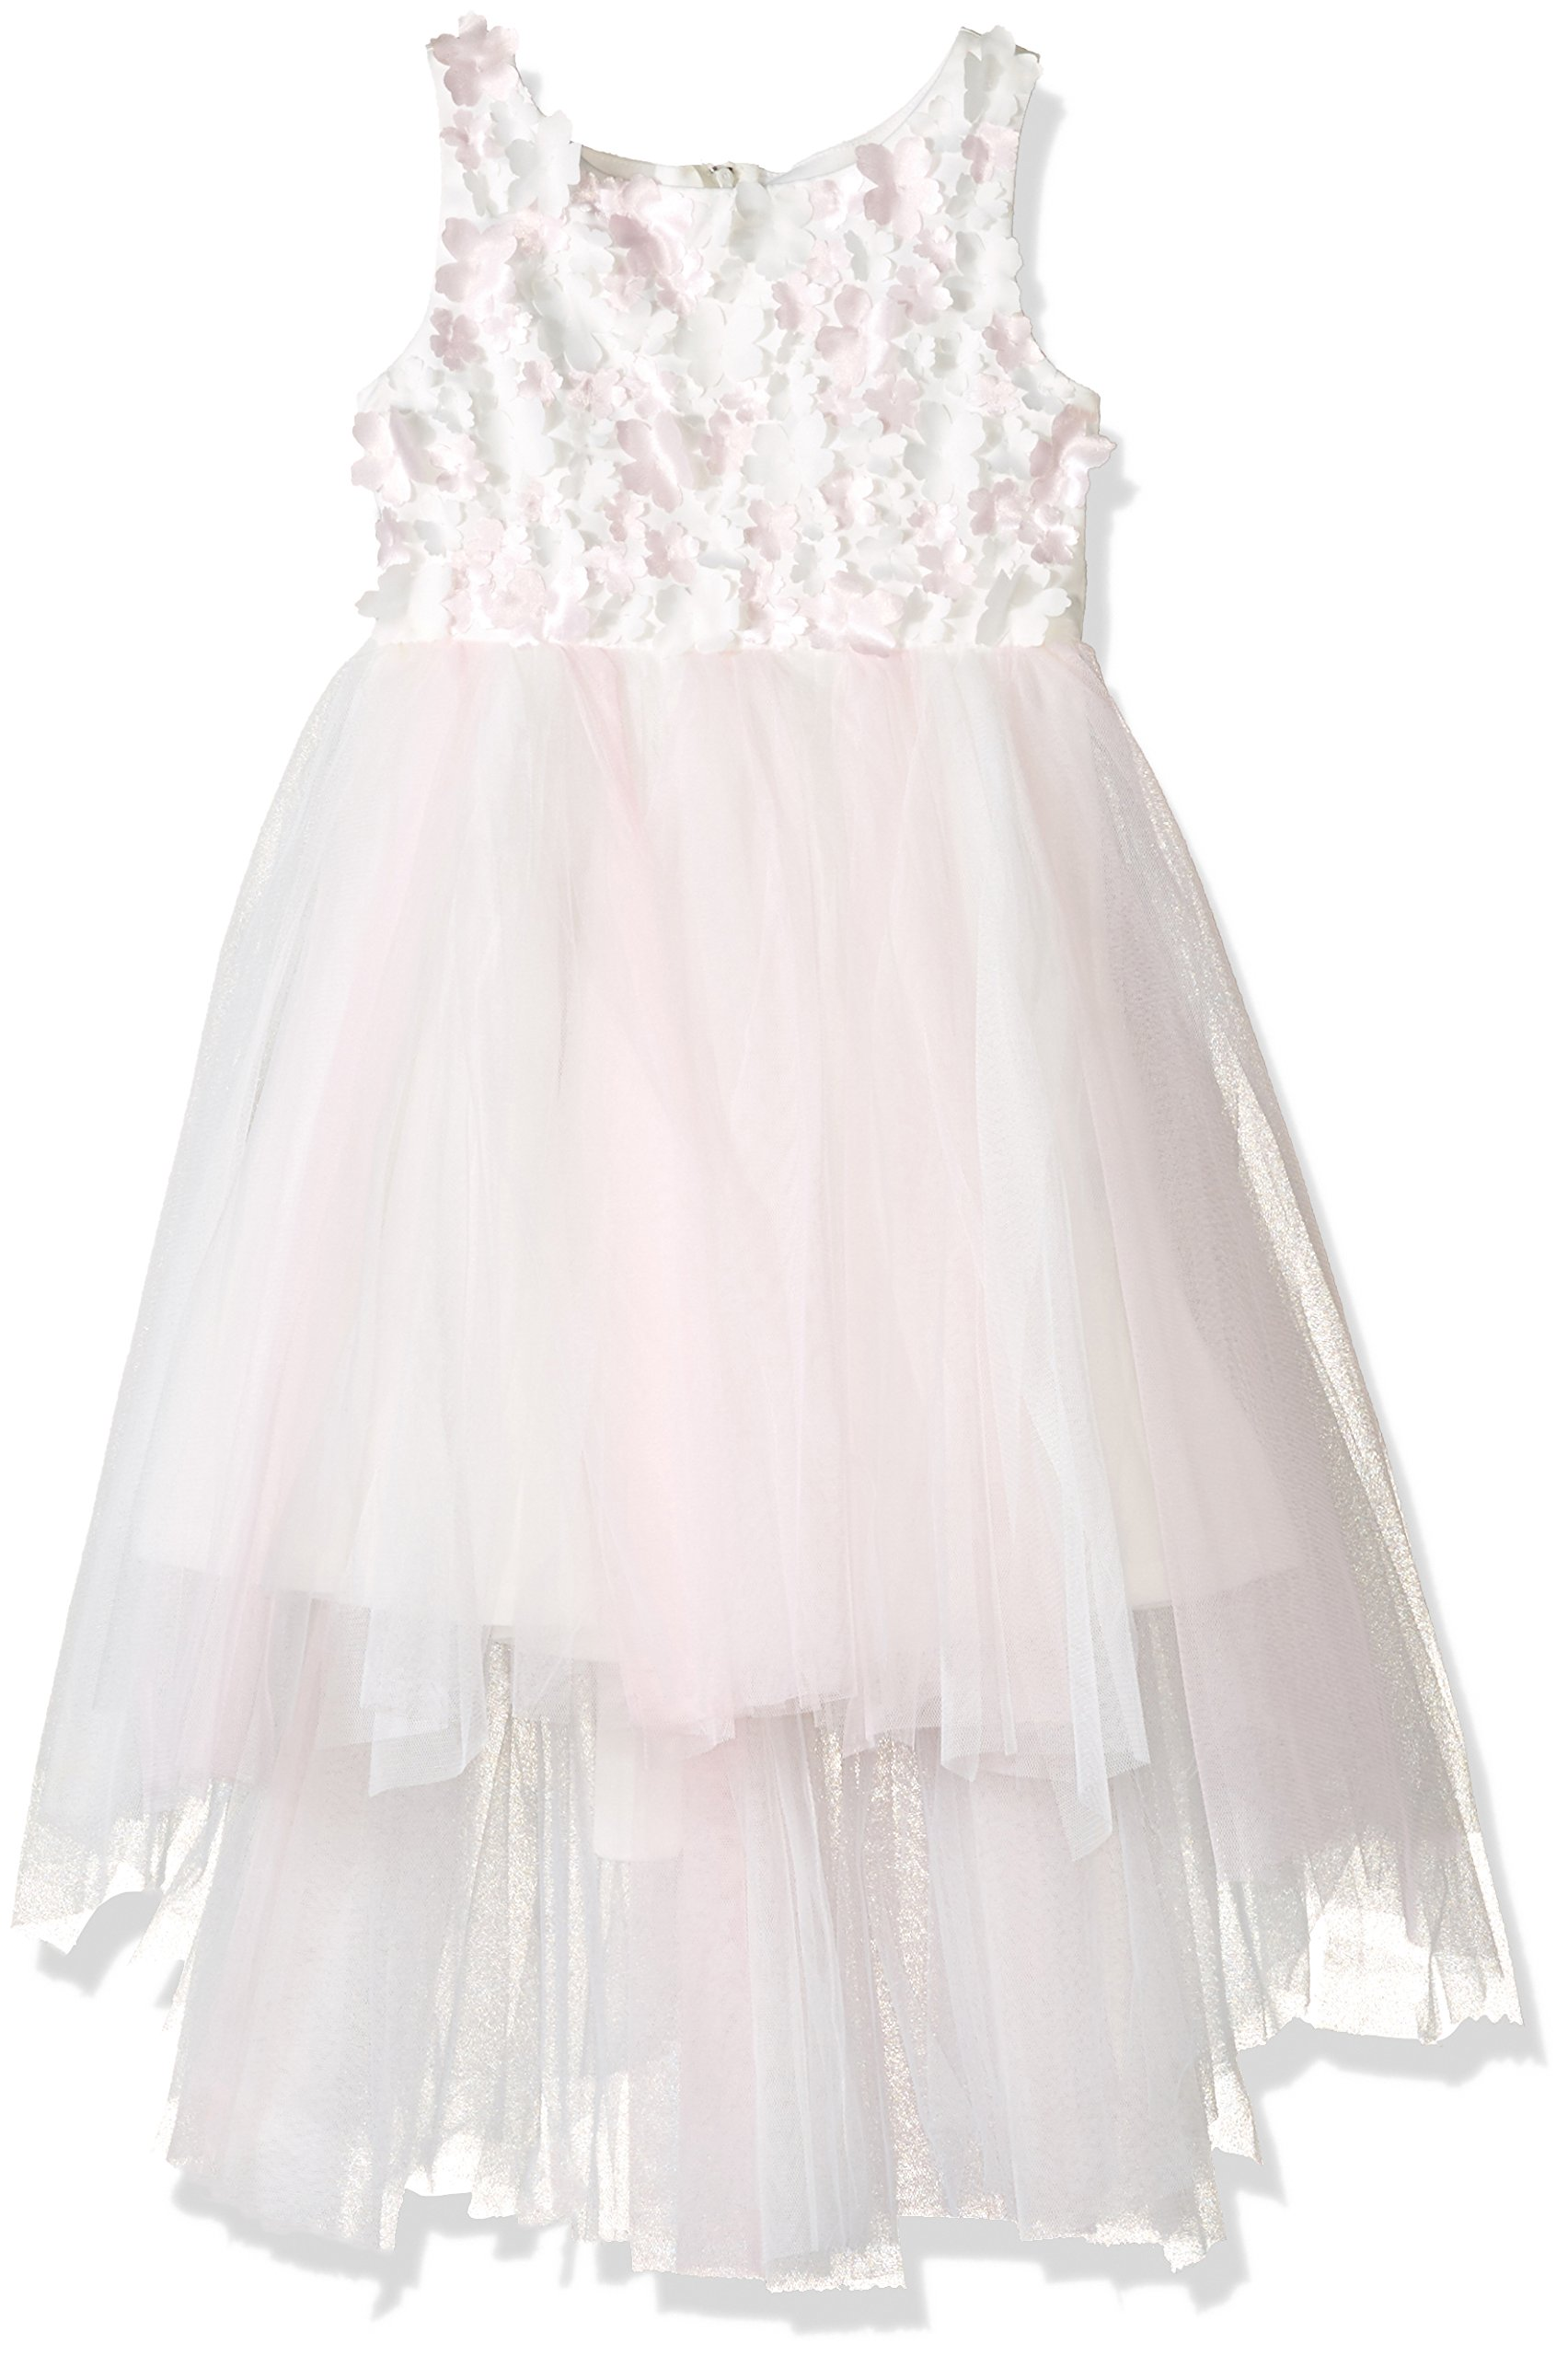 Biscotti Little Girls' Flower Frolic Hi Low Dress, Ivory/Pink, 6X by Biscotti